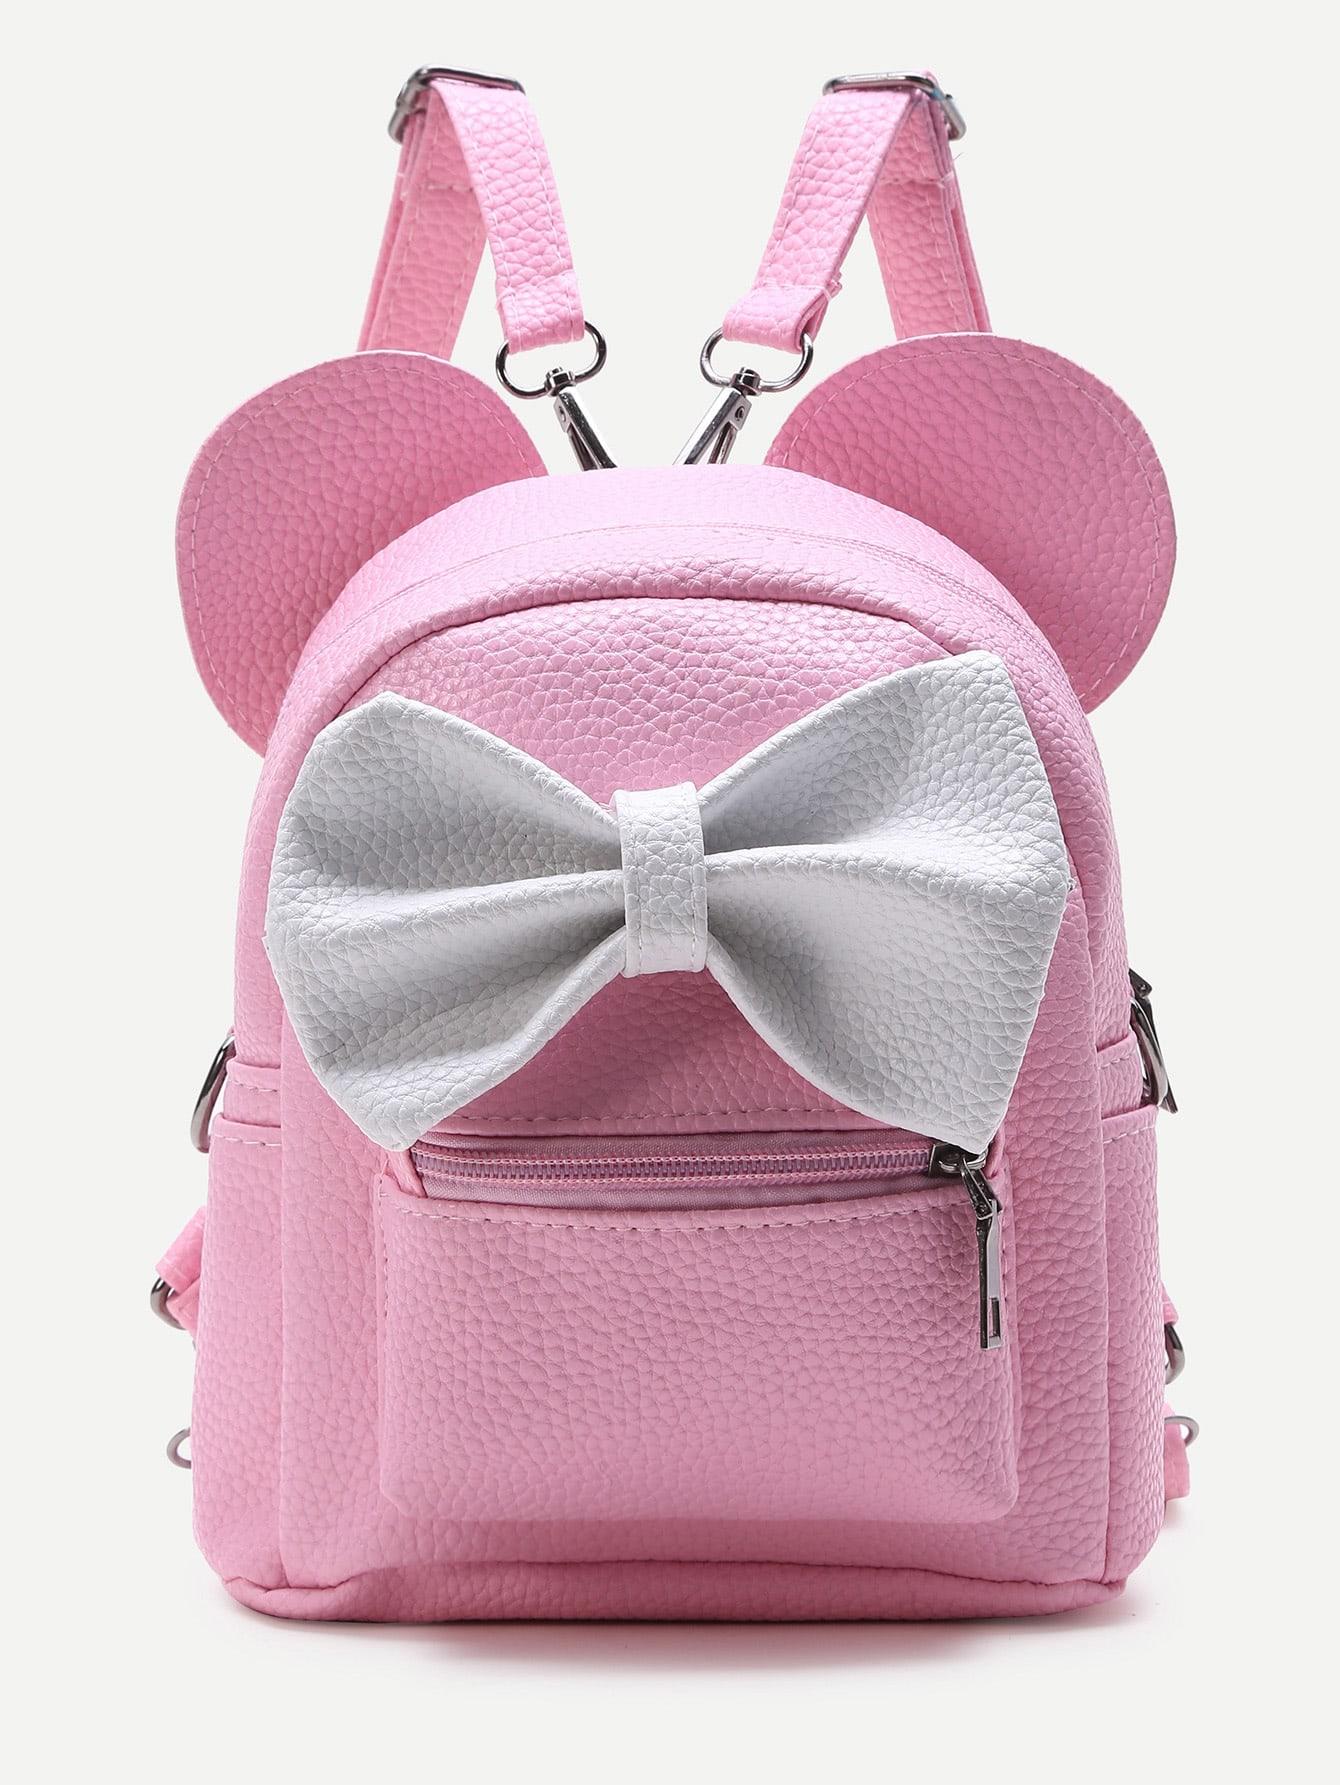 Фото Pink Ear Shaped PU Backpack With Contrast Bow. Купить с доставкой